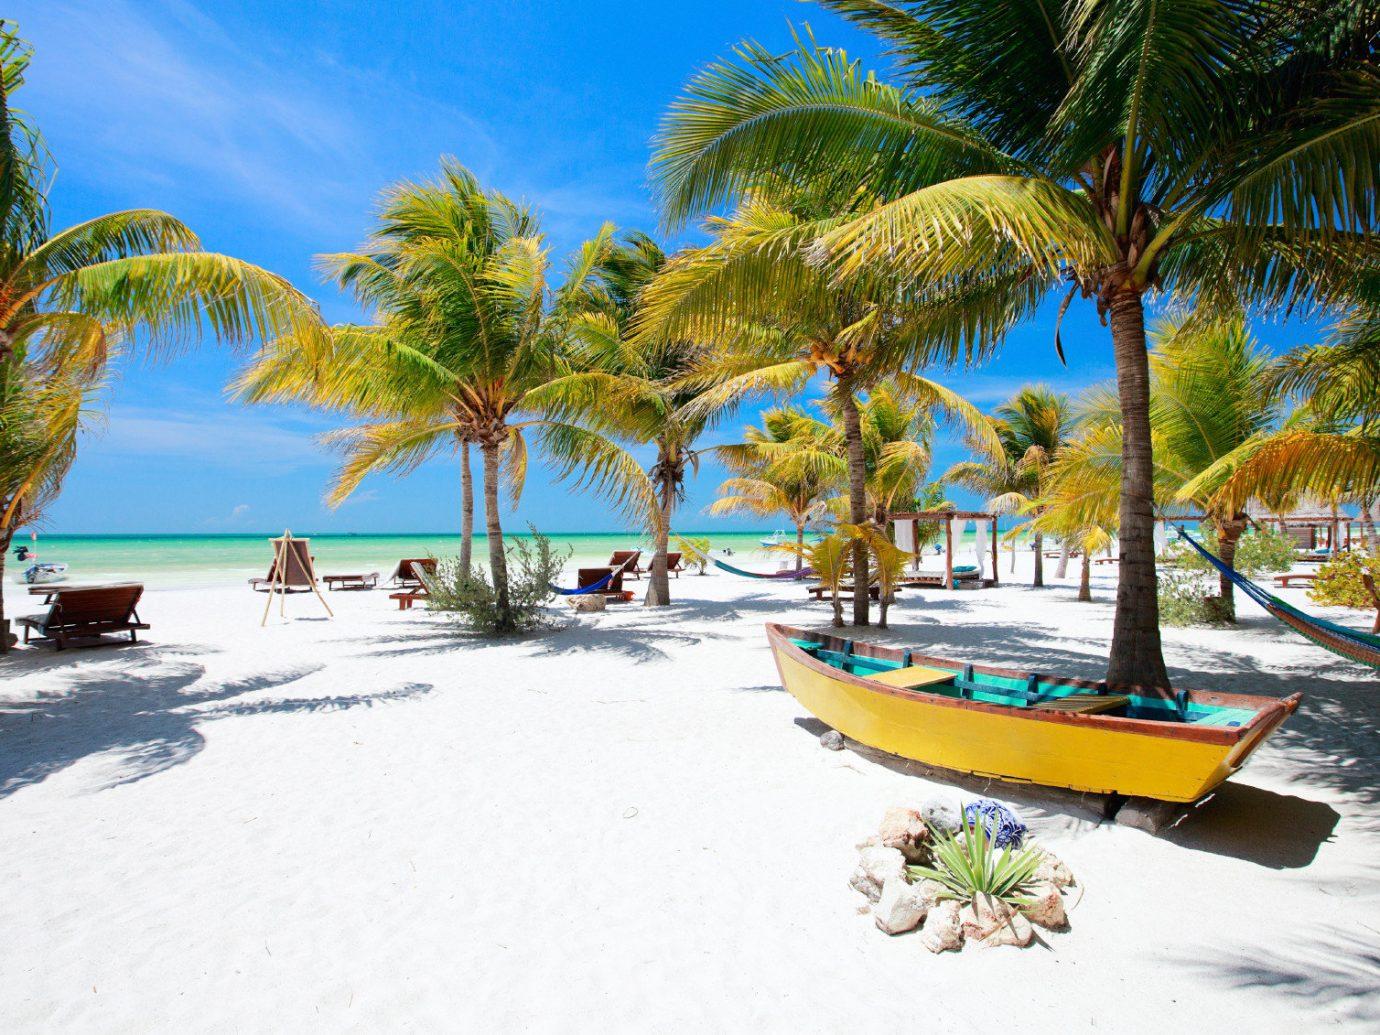 Mexico Trip Ideas Weekend Getaways tree outdoor sky Beach water palm leisure Resort caribbean vacation arecales Sea Ocean Pool Lagoon bay tropics Island plant shore sandy lined